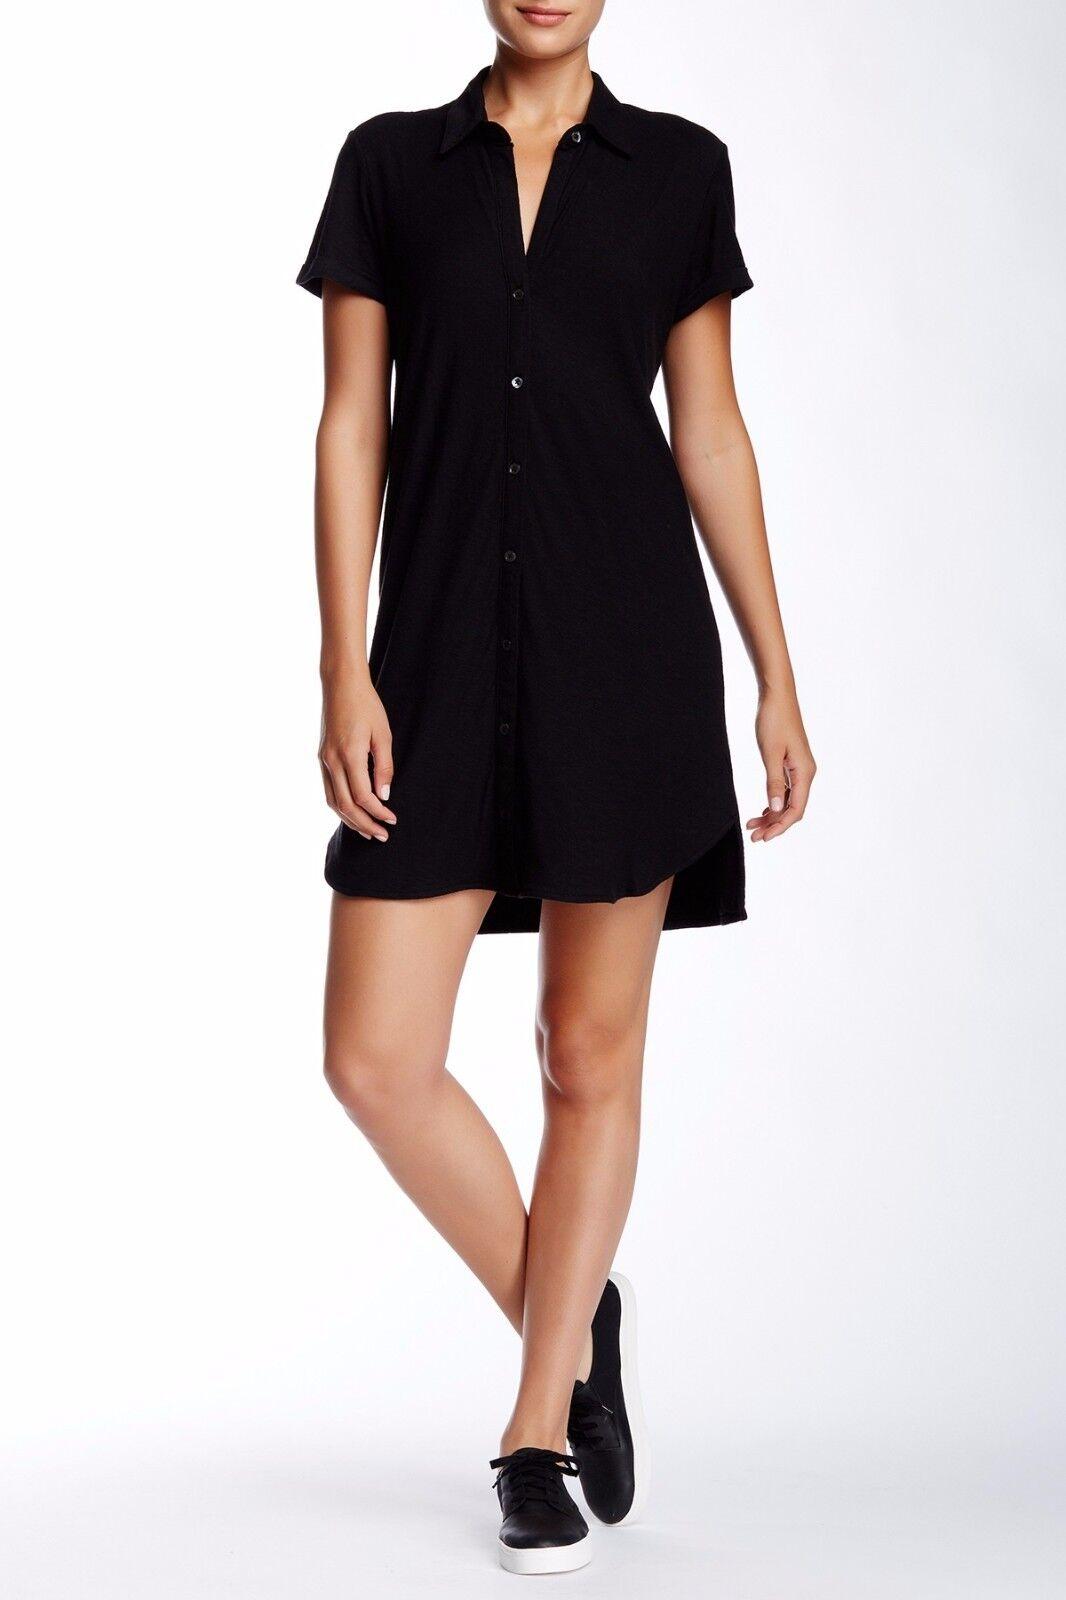 Nwt James Perse Sz4 (L XL) Kurzärmlig Shift Jerseyhemd Kleid Schwarz